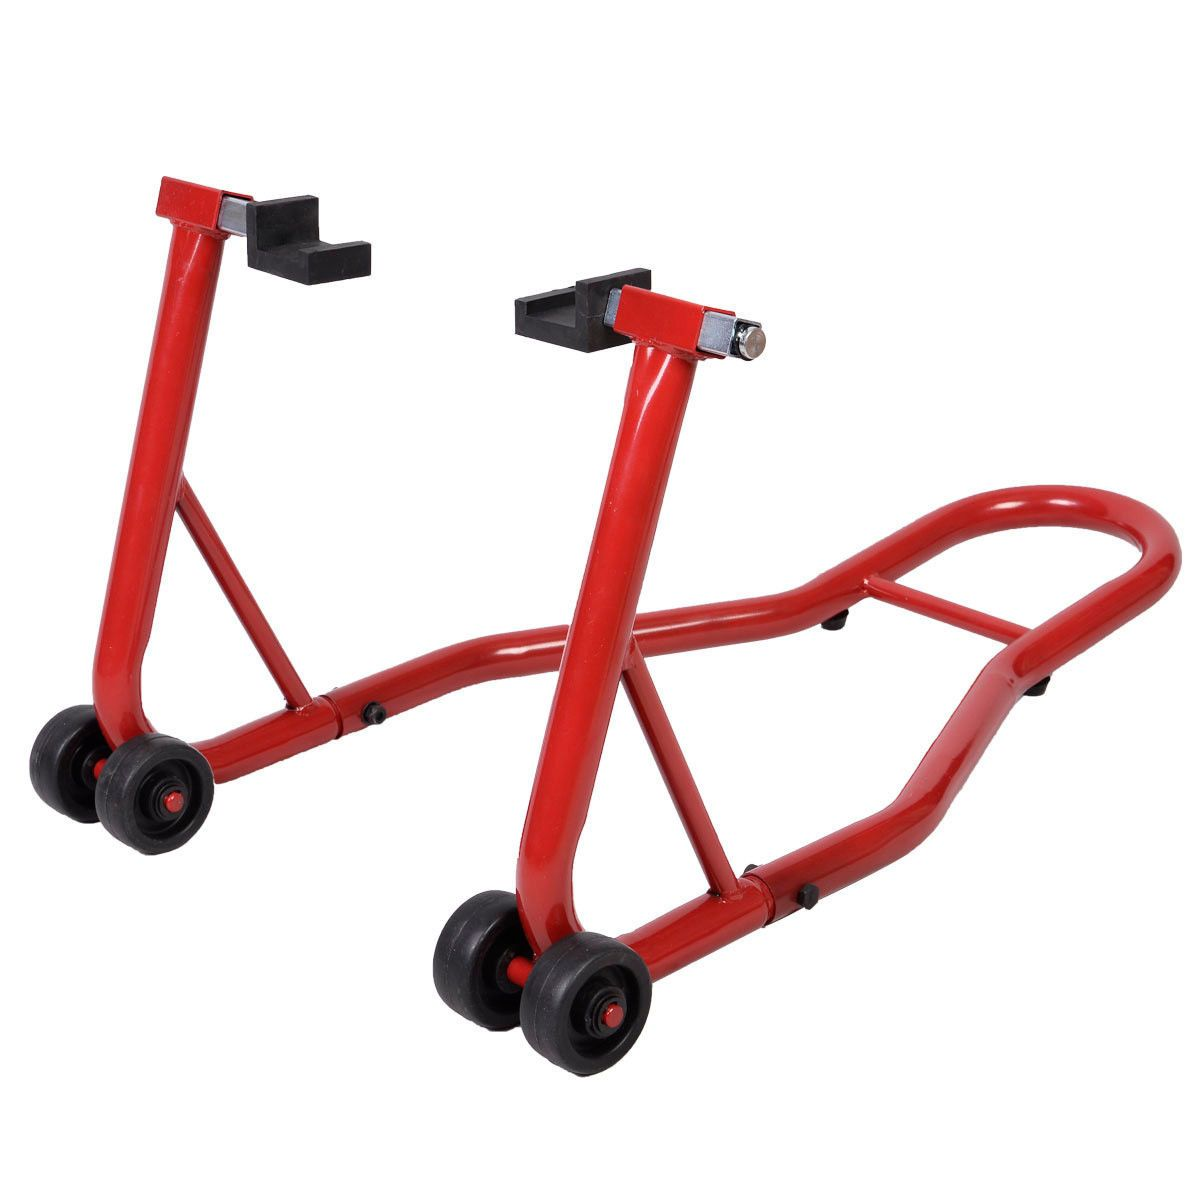 Motorcycle Bike Stand Rear Forklift Spoolift Paddock Swingarm Lift